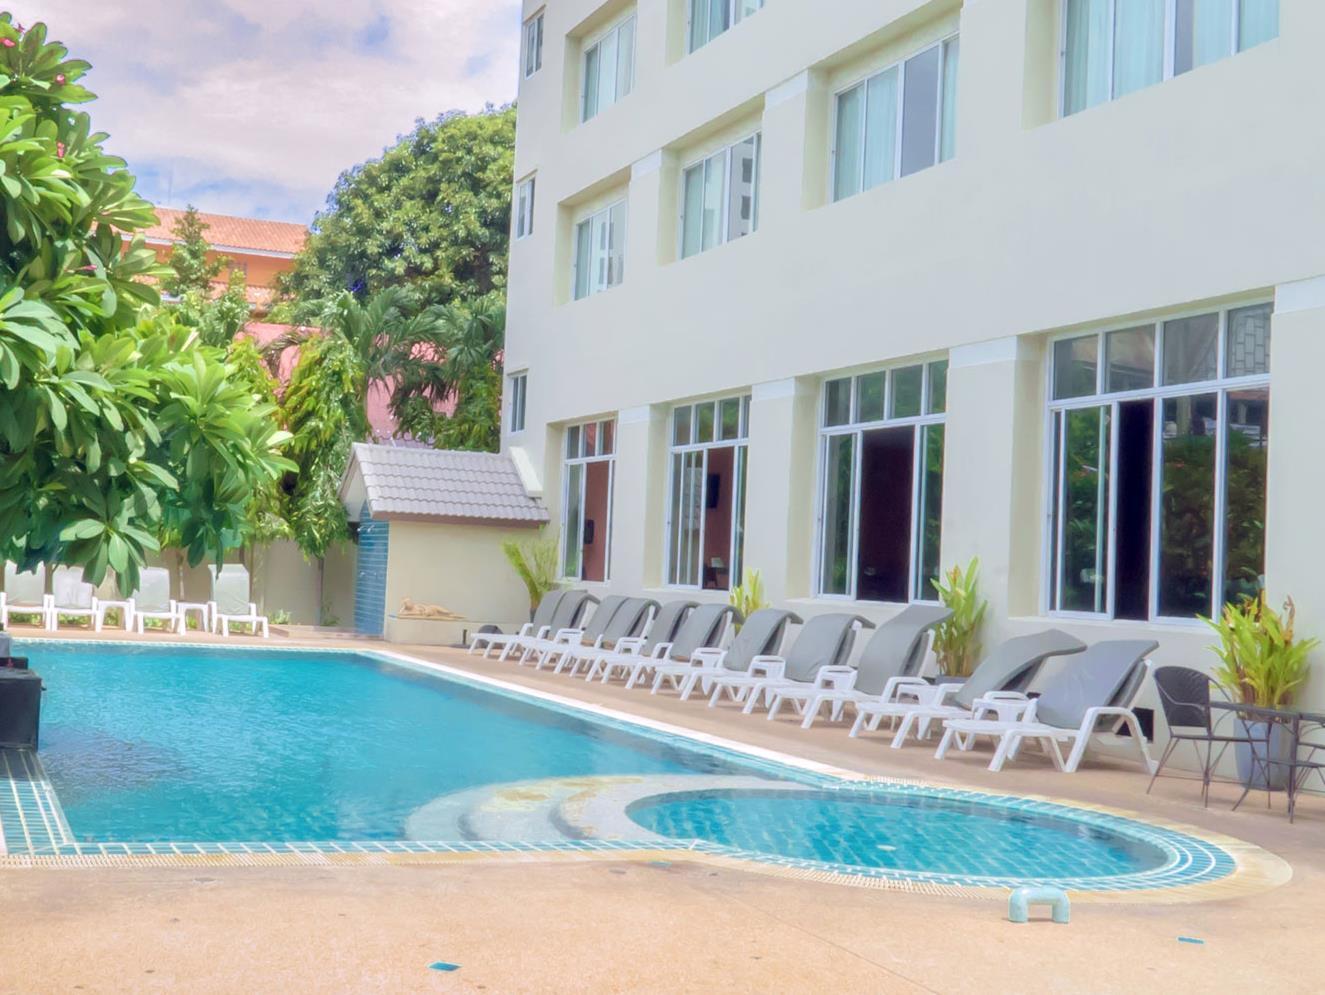 Crown Pattaya Beach Hotel Thailand Jaminan Harga Terbaik